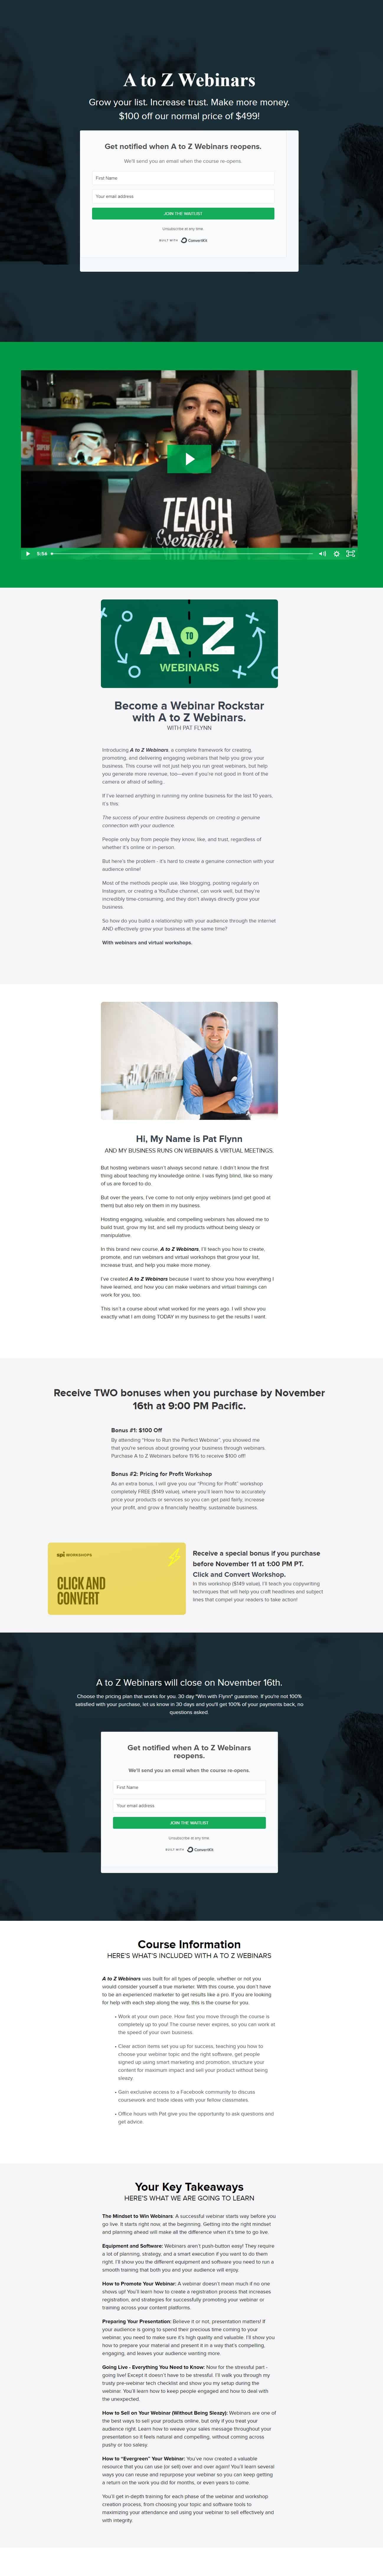 A to Z Webinars by Pat Flynn Sales Page